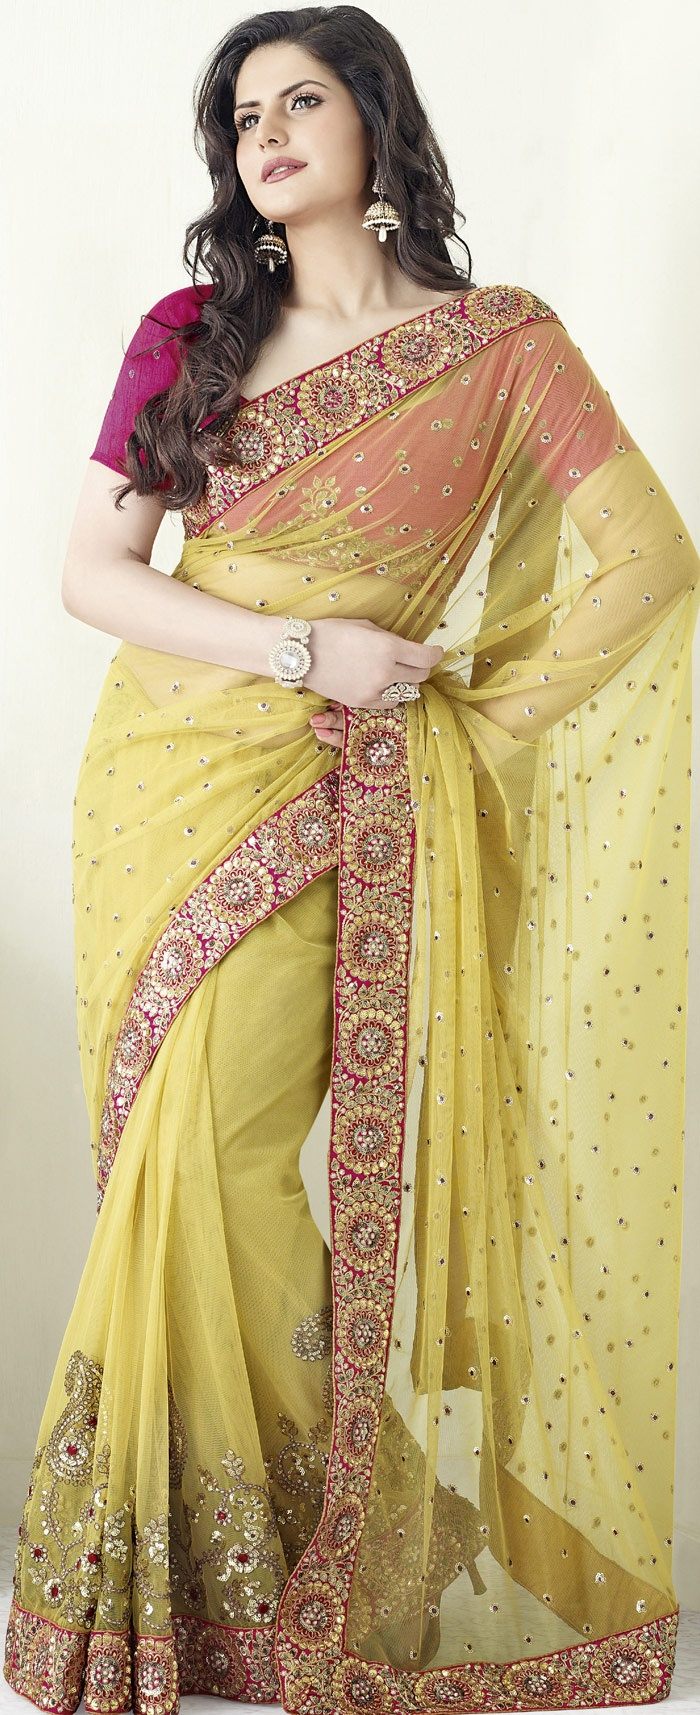 #Golden #Net #Saree with Blouse | @ $165.45